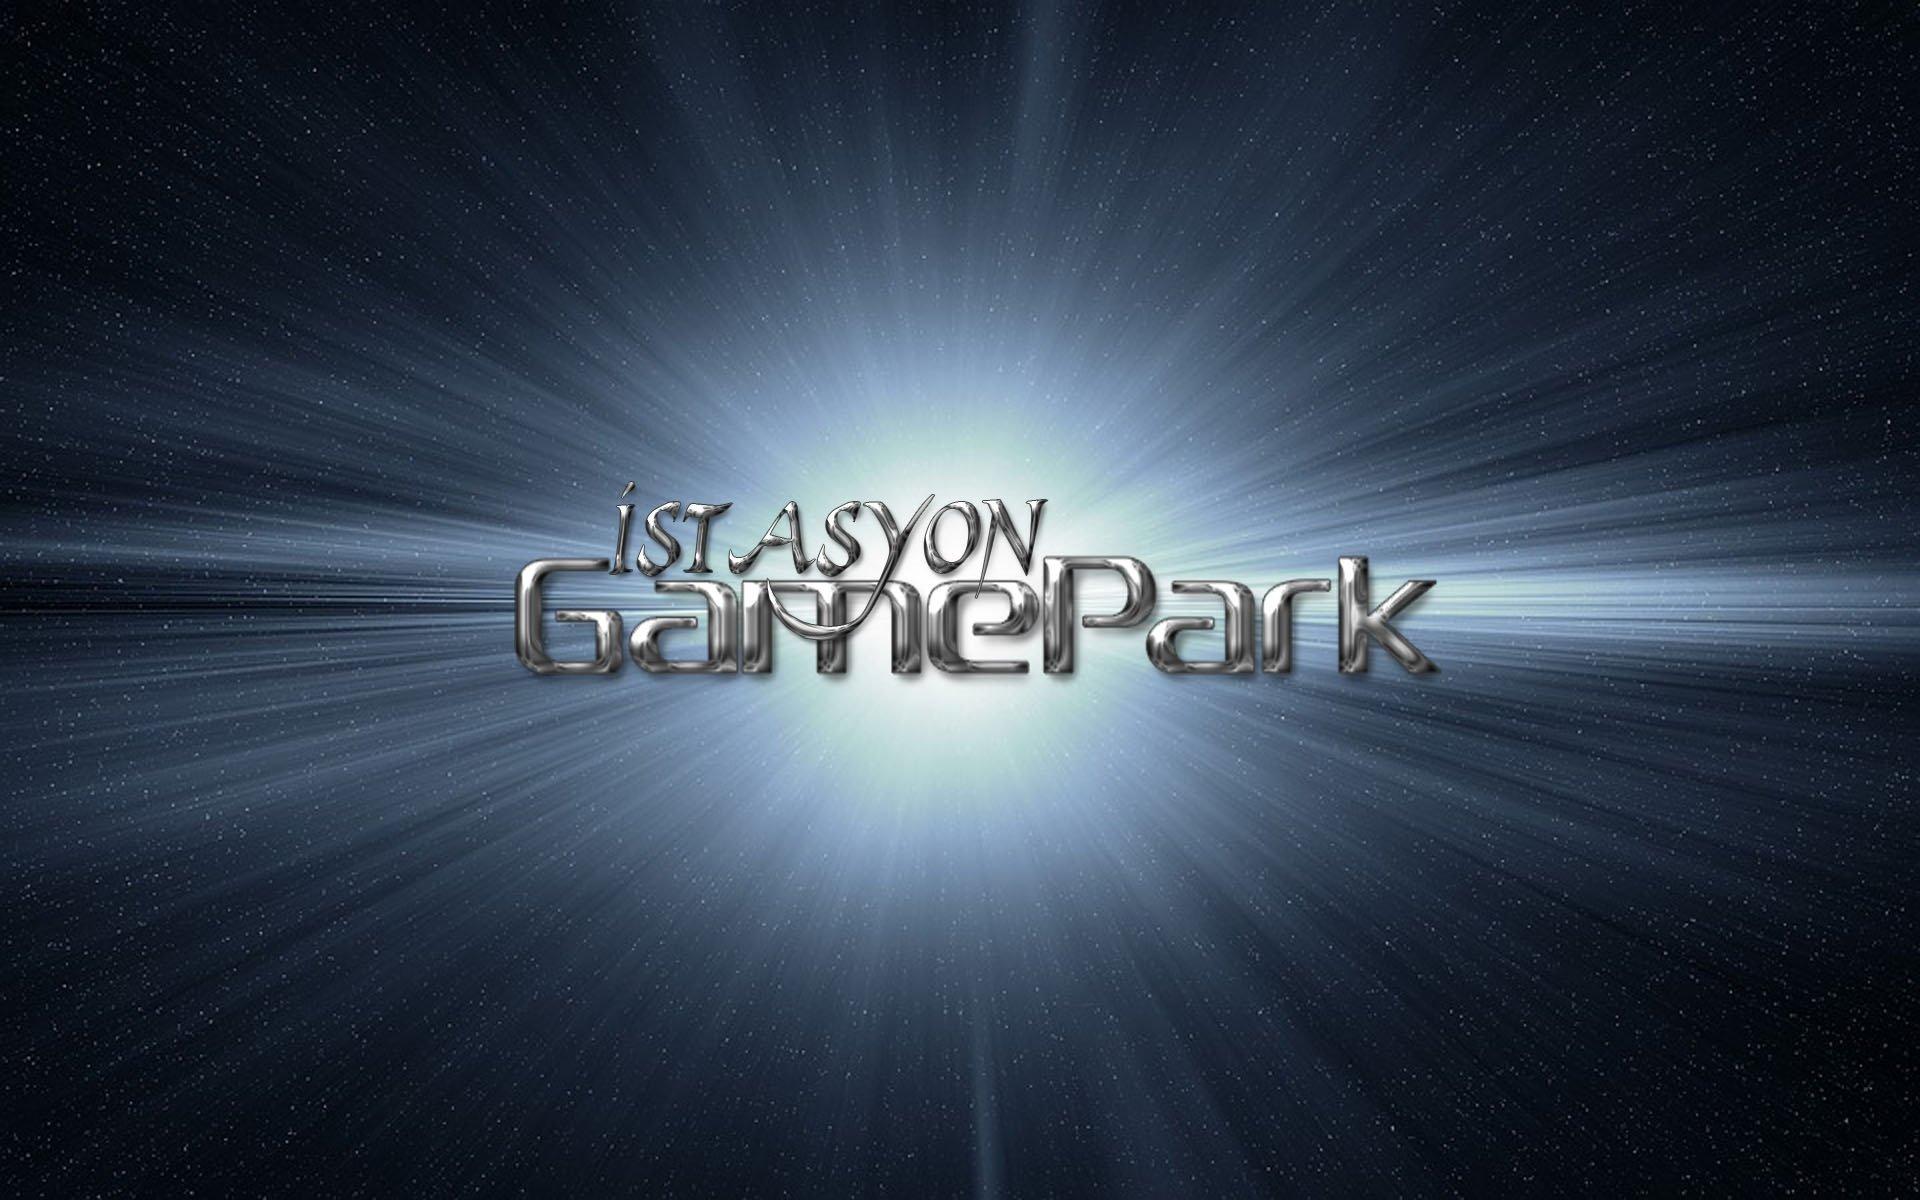 İstasyon GamePark